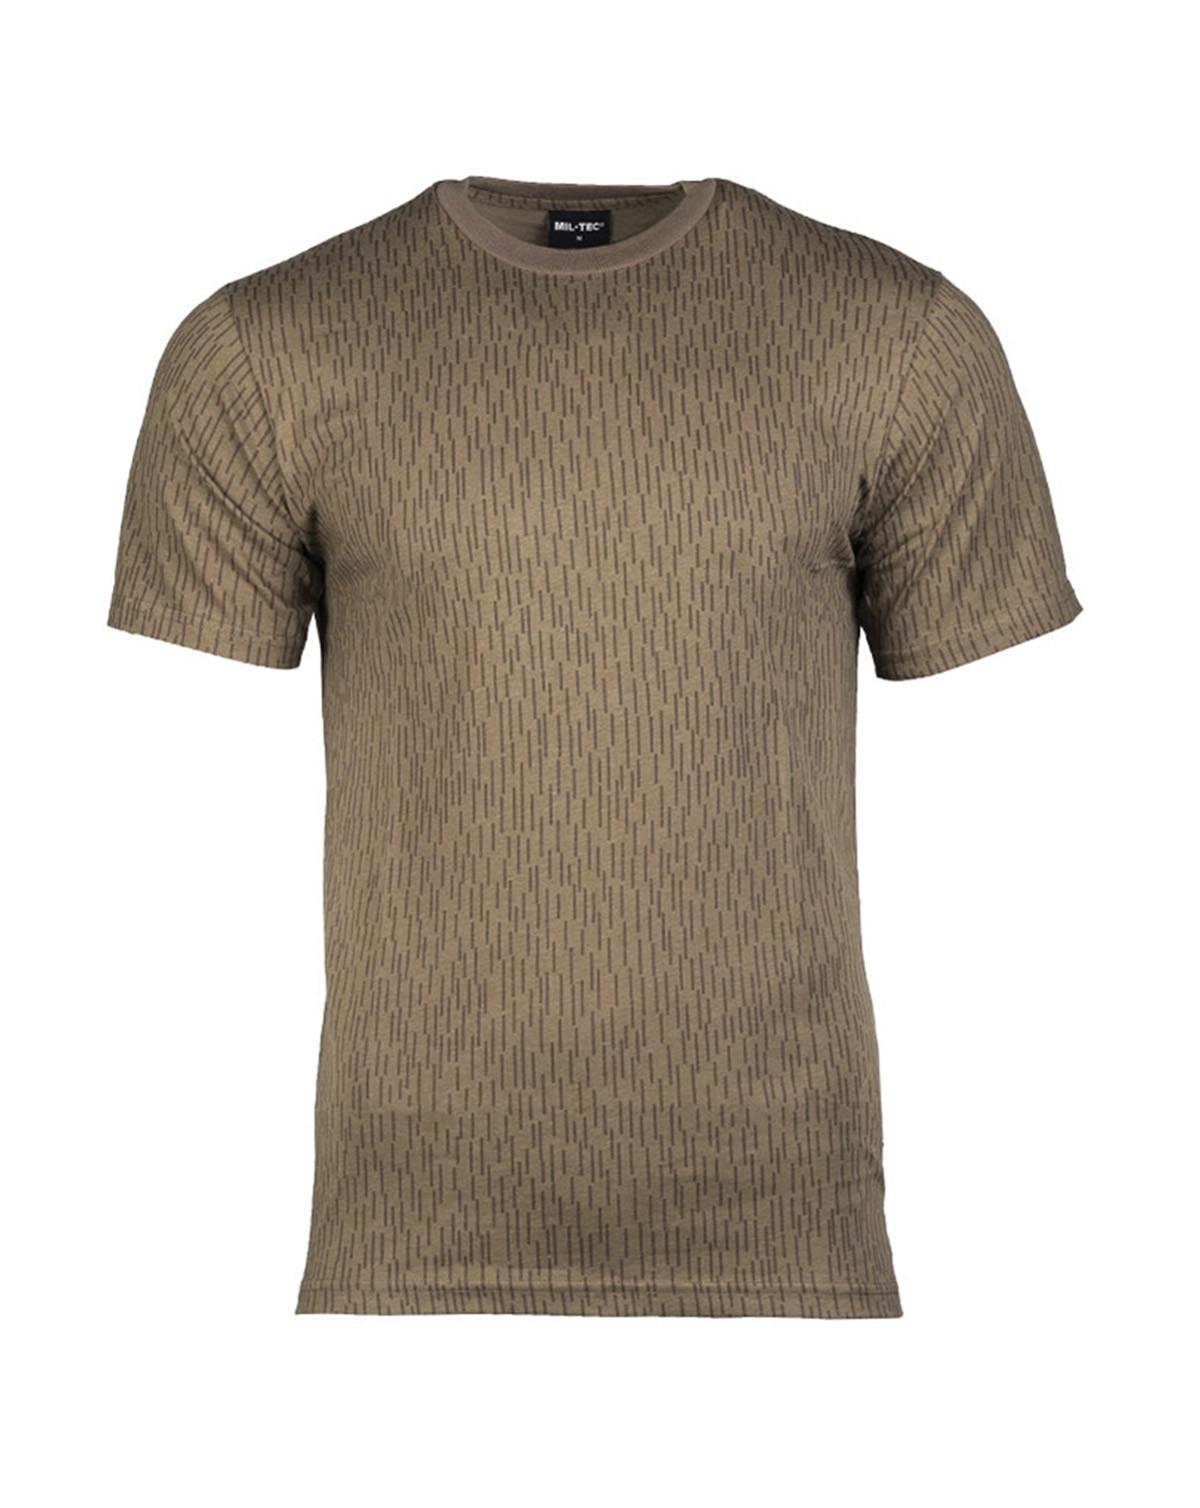 Mil-Tec Camouflage T-shirts (NVA Strichtarn / Regnvejrscamo, S)